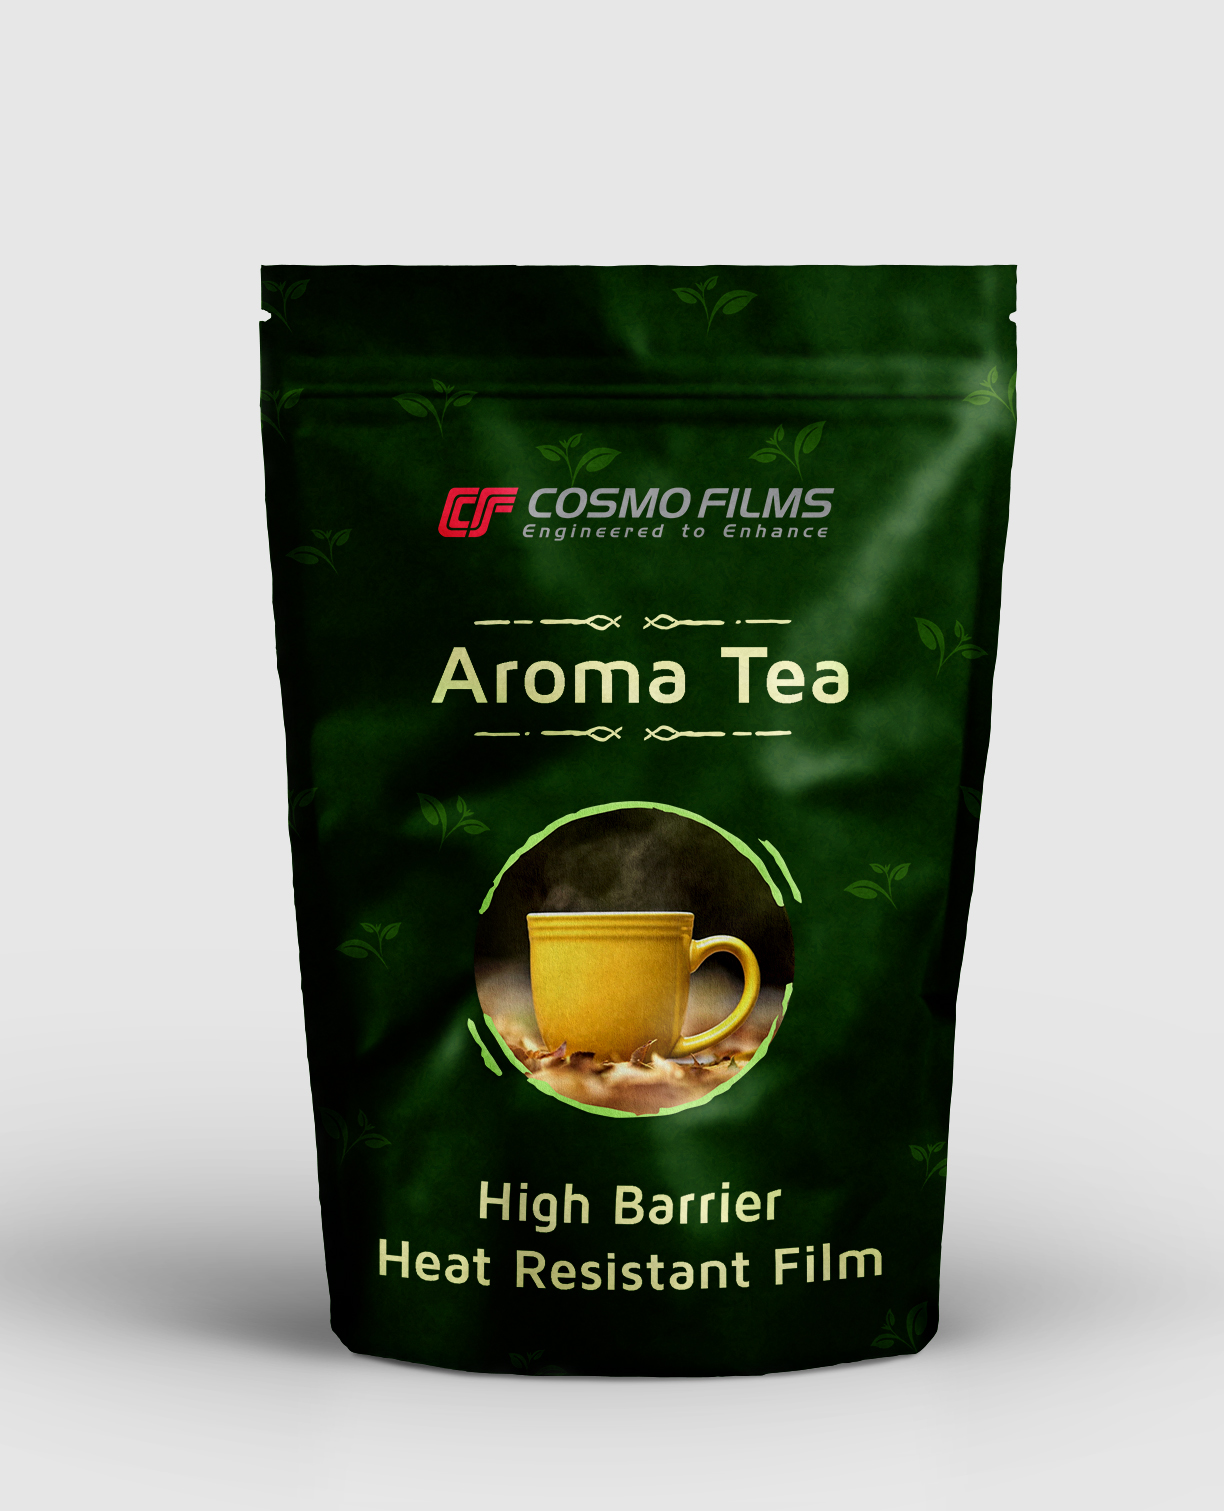 Heat resistant films